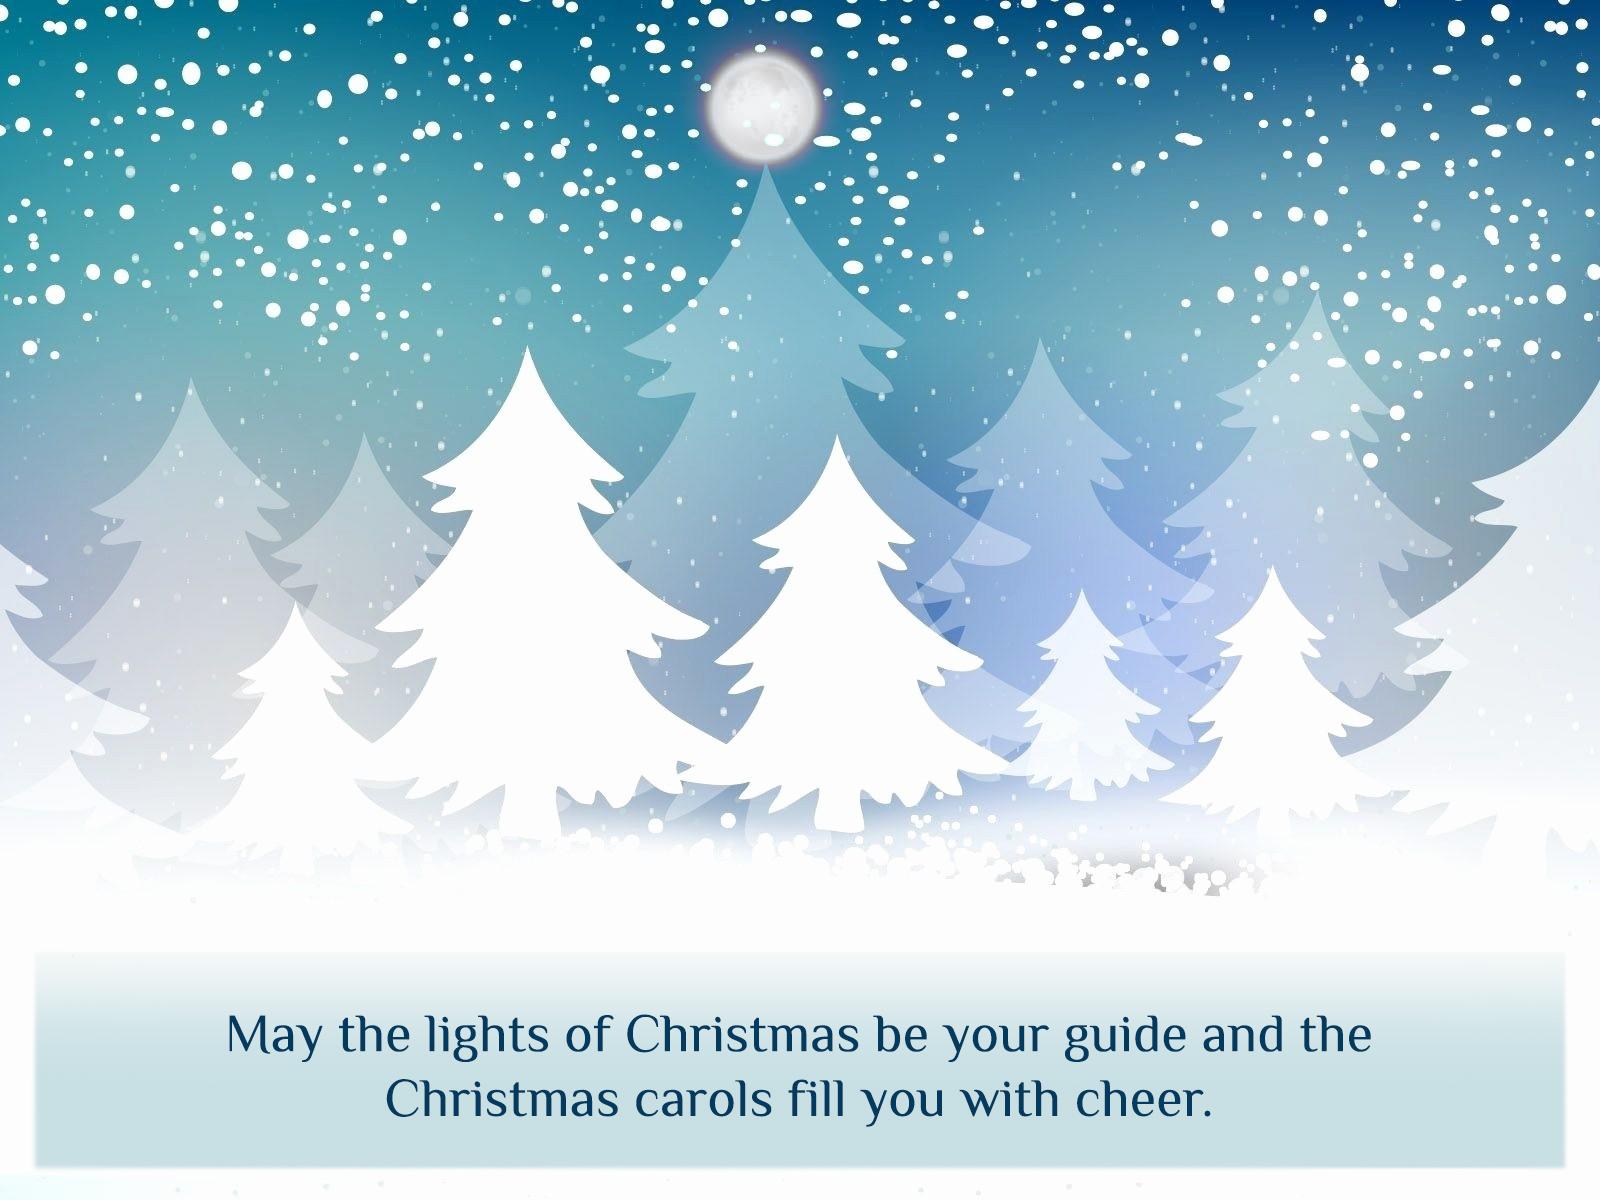 Merry Christmas Status 2019